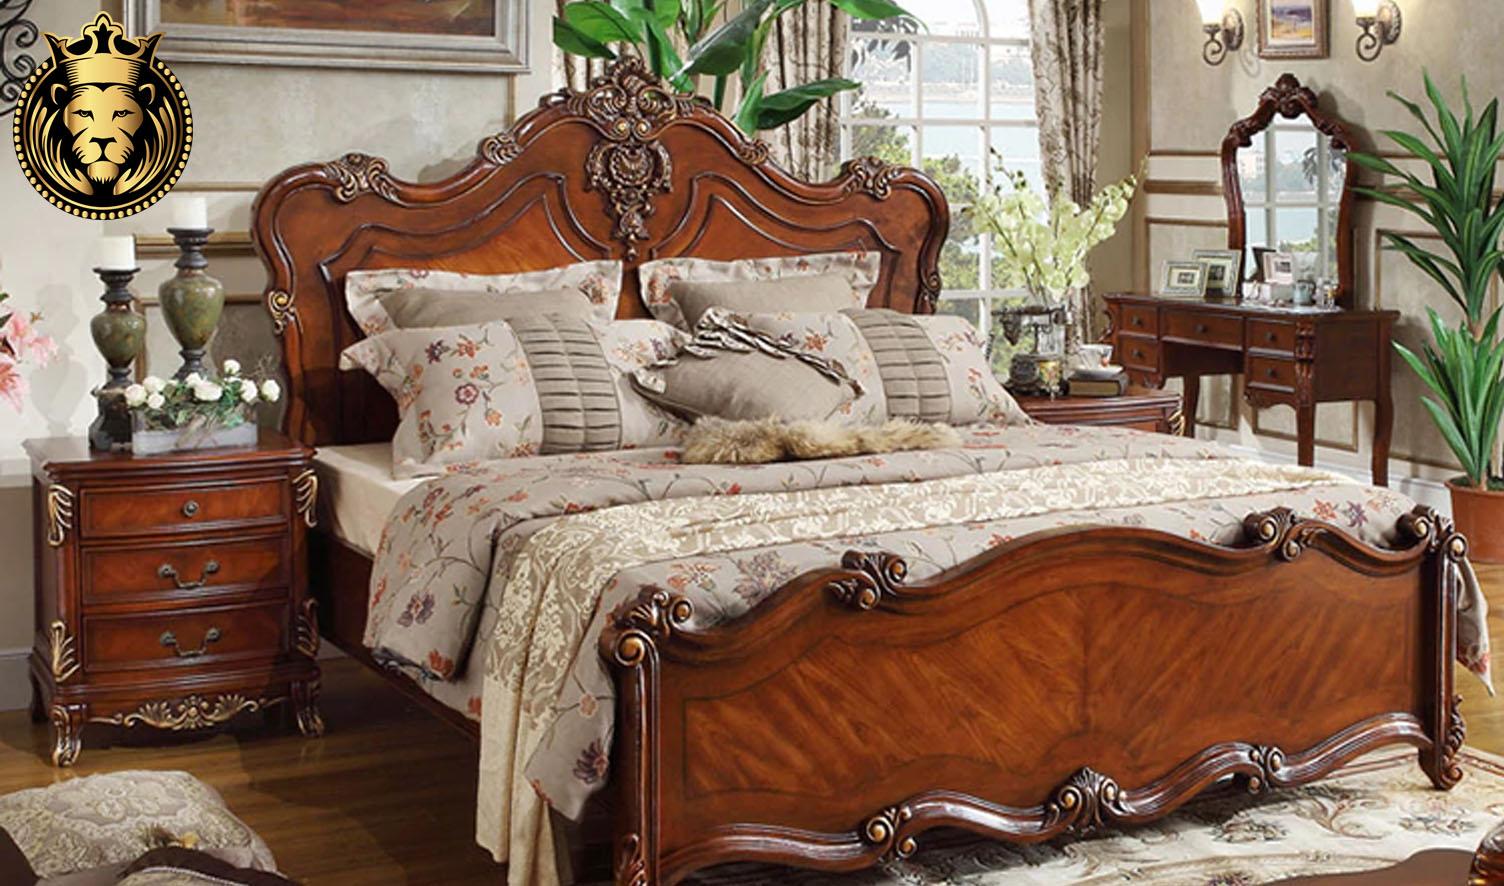 Hyderabad antique style carved teak wood bed